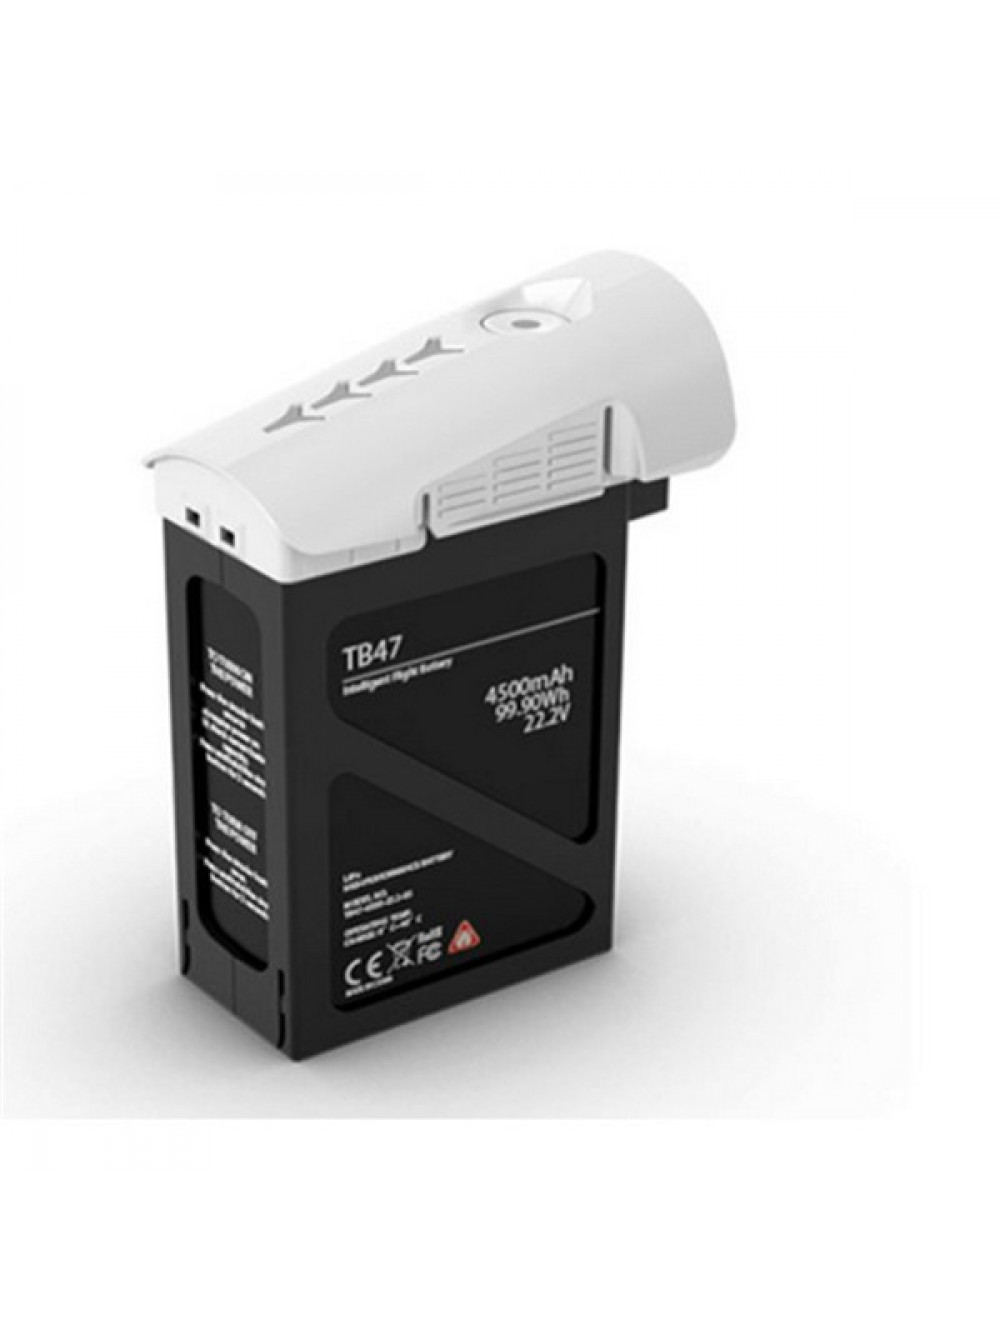 Аккумулятор 4500 мАч для Inspire 1